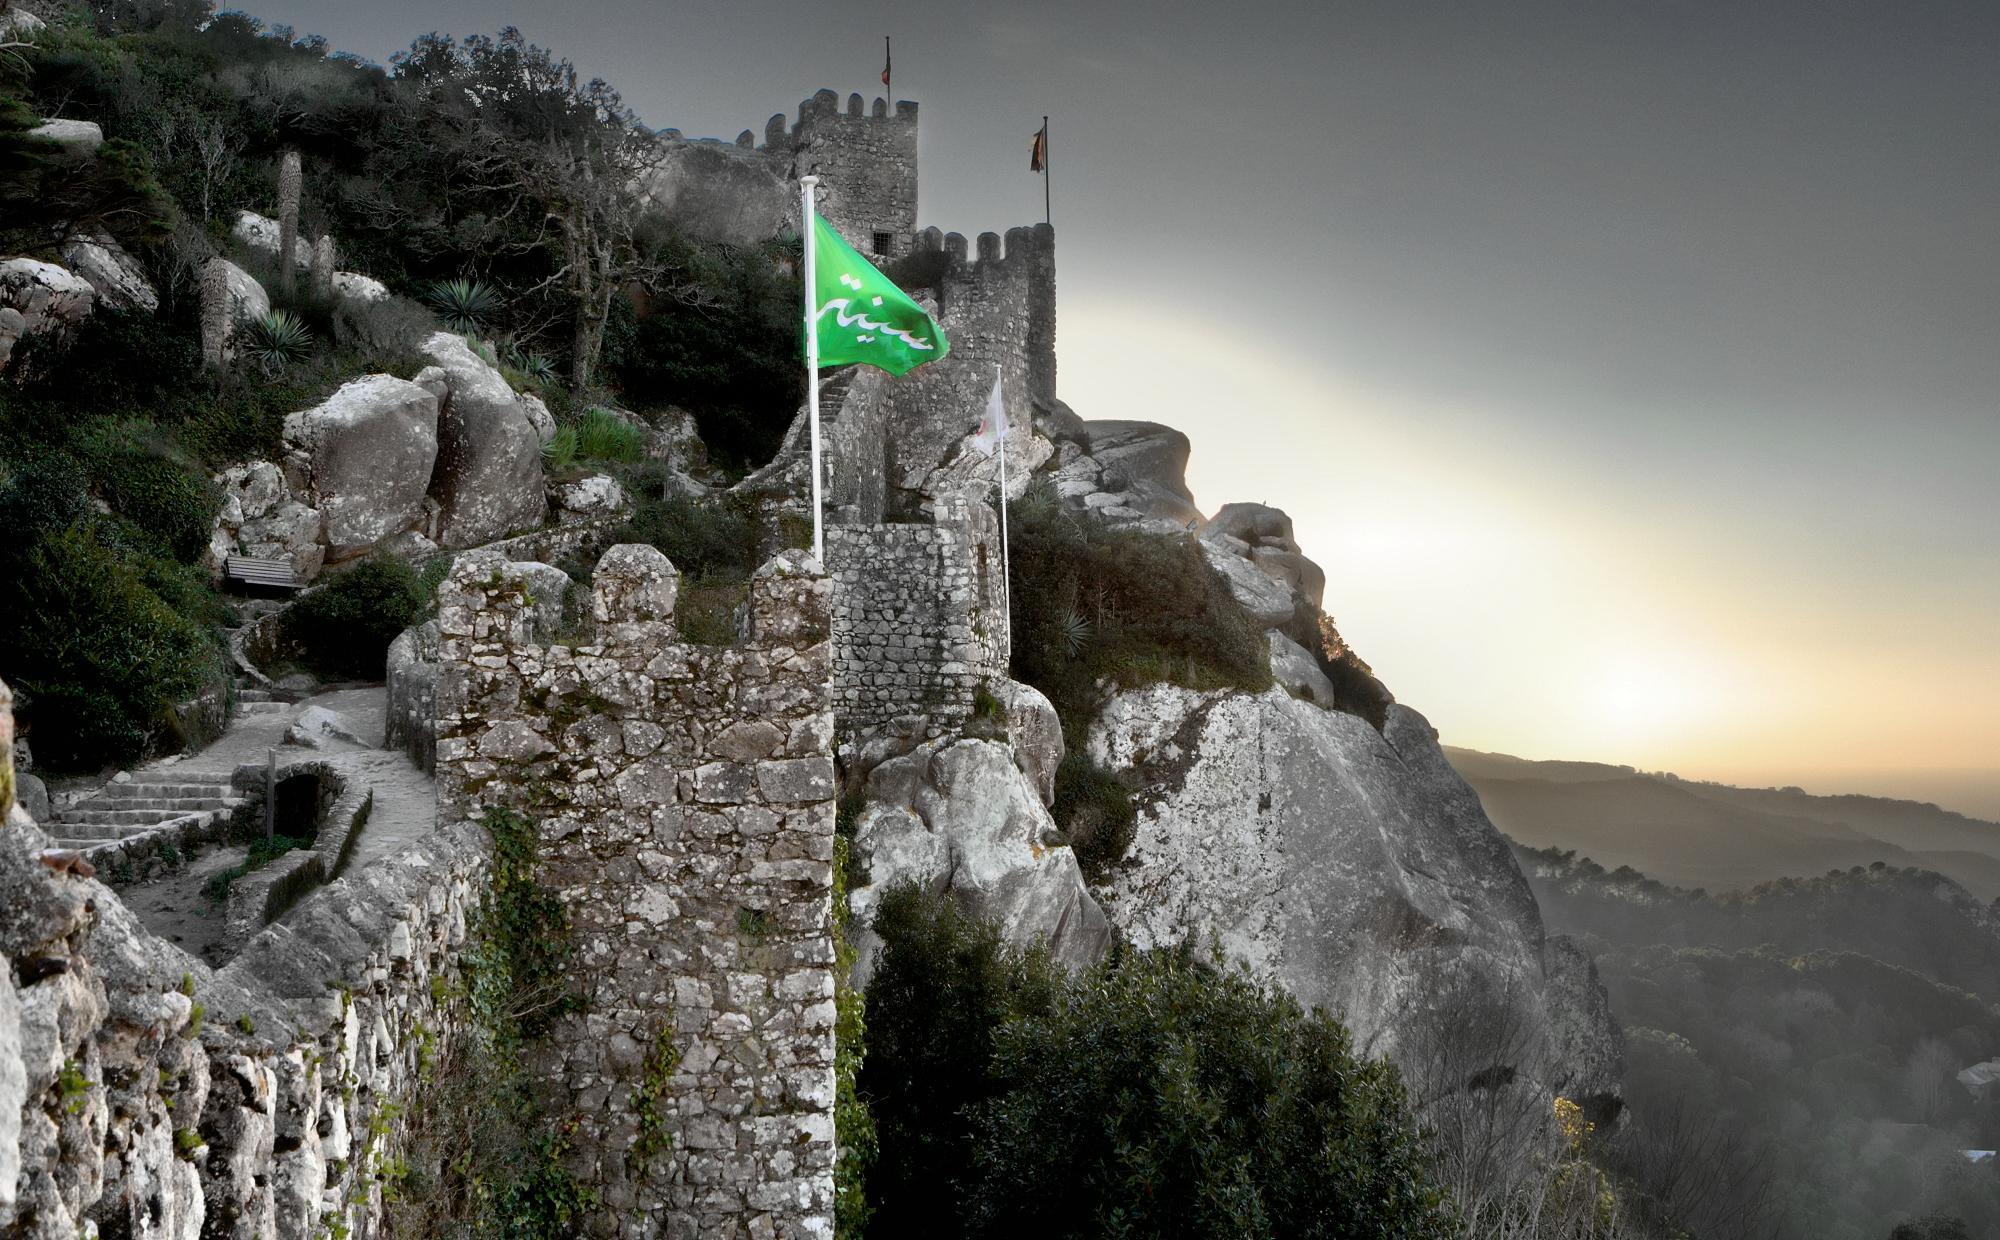 pt-lisbon - ポルトガル世界文化遺産シントラ ペーナ宮殿・ムーア城跡・レガレイラ宮殿を巡る - 旅ログヨーロッパ, 建造物, ポルトガル街歩き